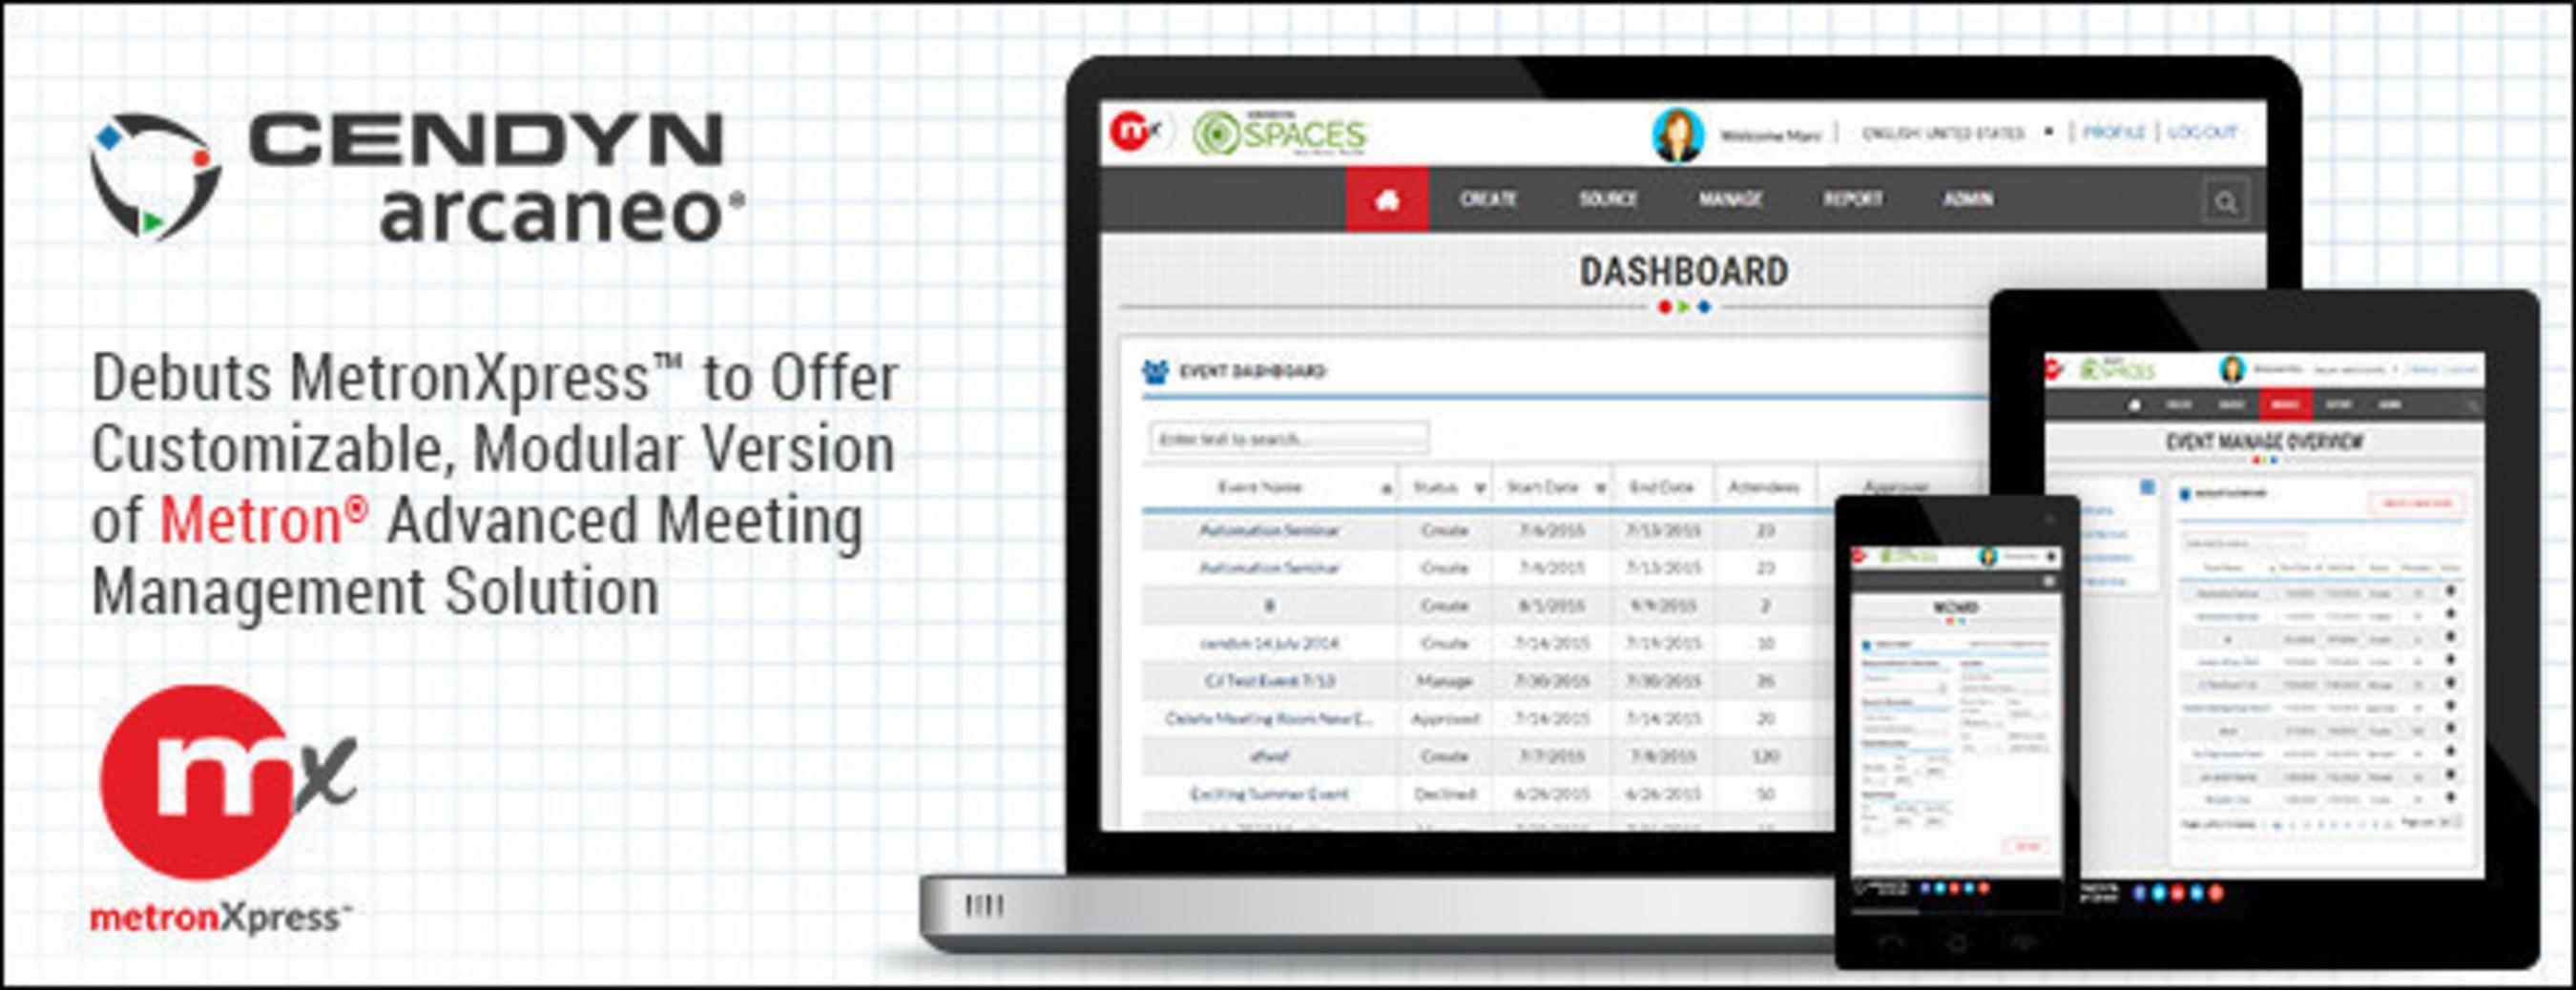 Cendyn Arcaneo® Reveals MetronXpress™ to Offer Customizable, Modular Version of Metron® Advanced